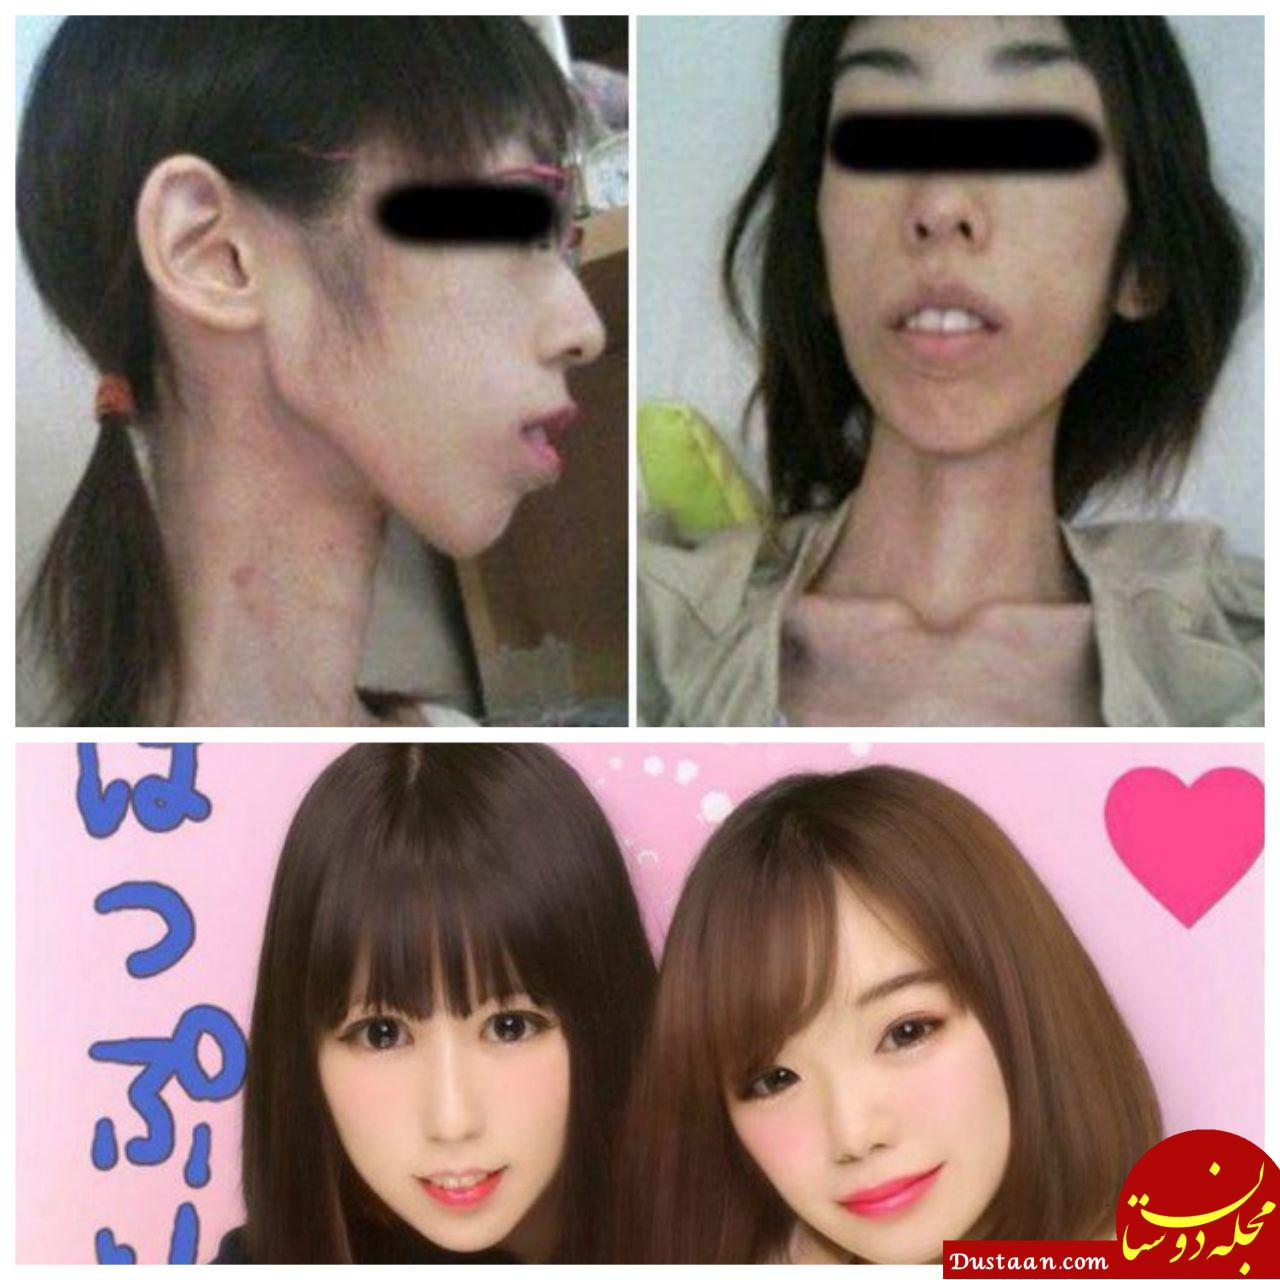 www.dustaan.com دختر جوانی که به خاطر شکنجه والدینش 17 کیلو شد! +تصاویر